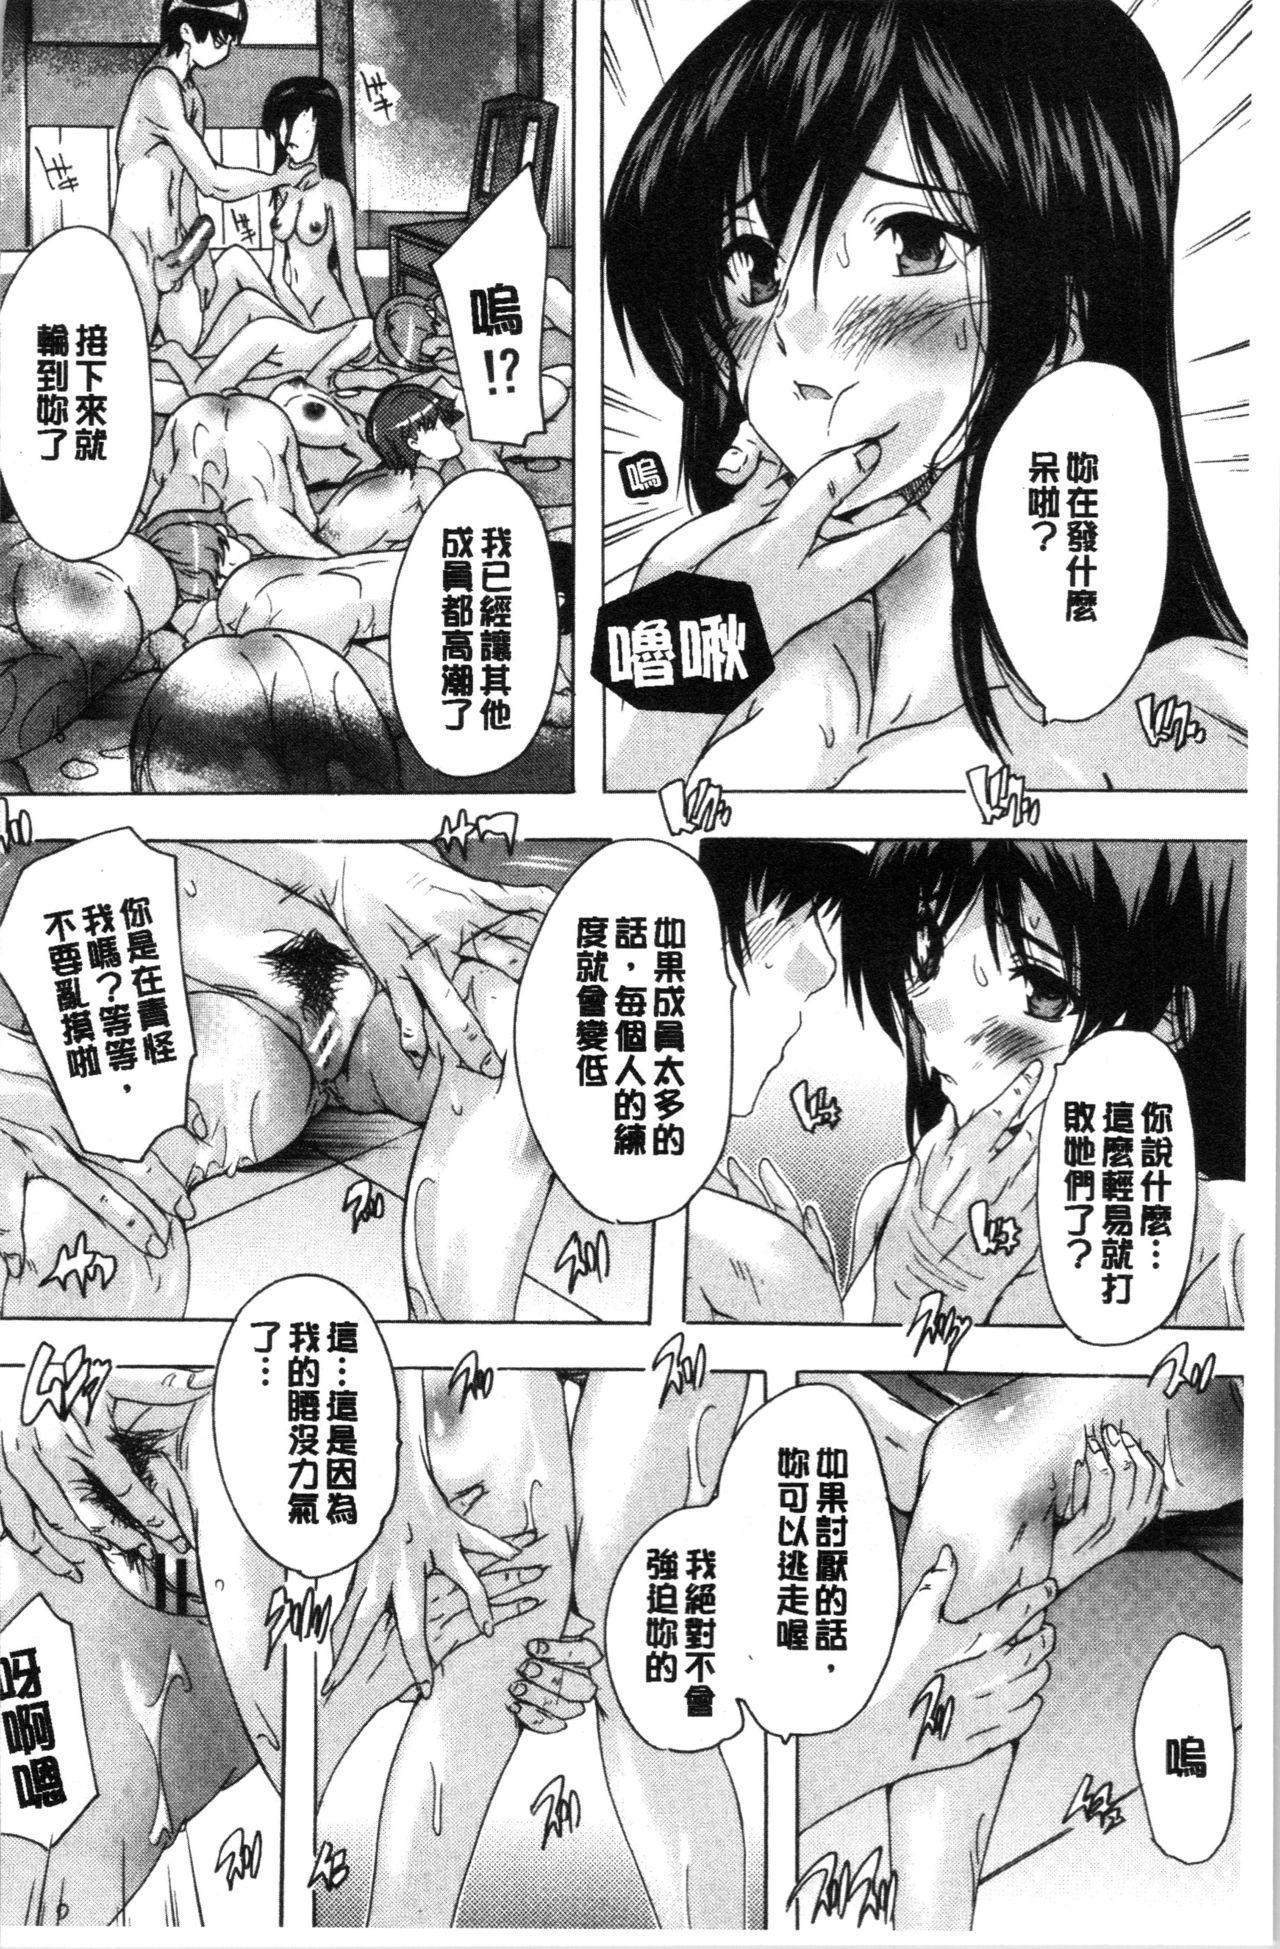 [Natsuka Q-Ya] Hisshuu!! Sex-bu - SEIGI-DO The Ultimate Martial Arts   必修!!性愛淫交部 [Chinese] 160